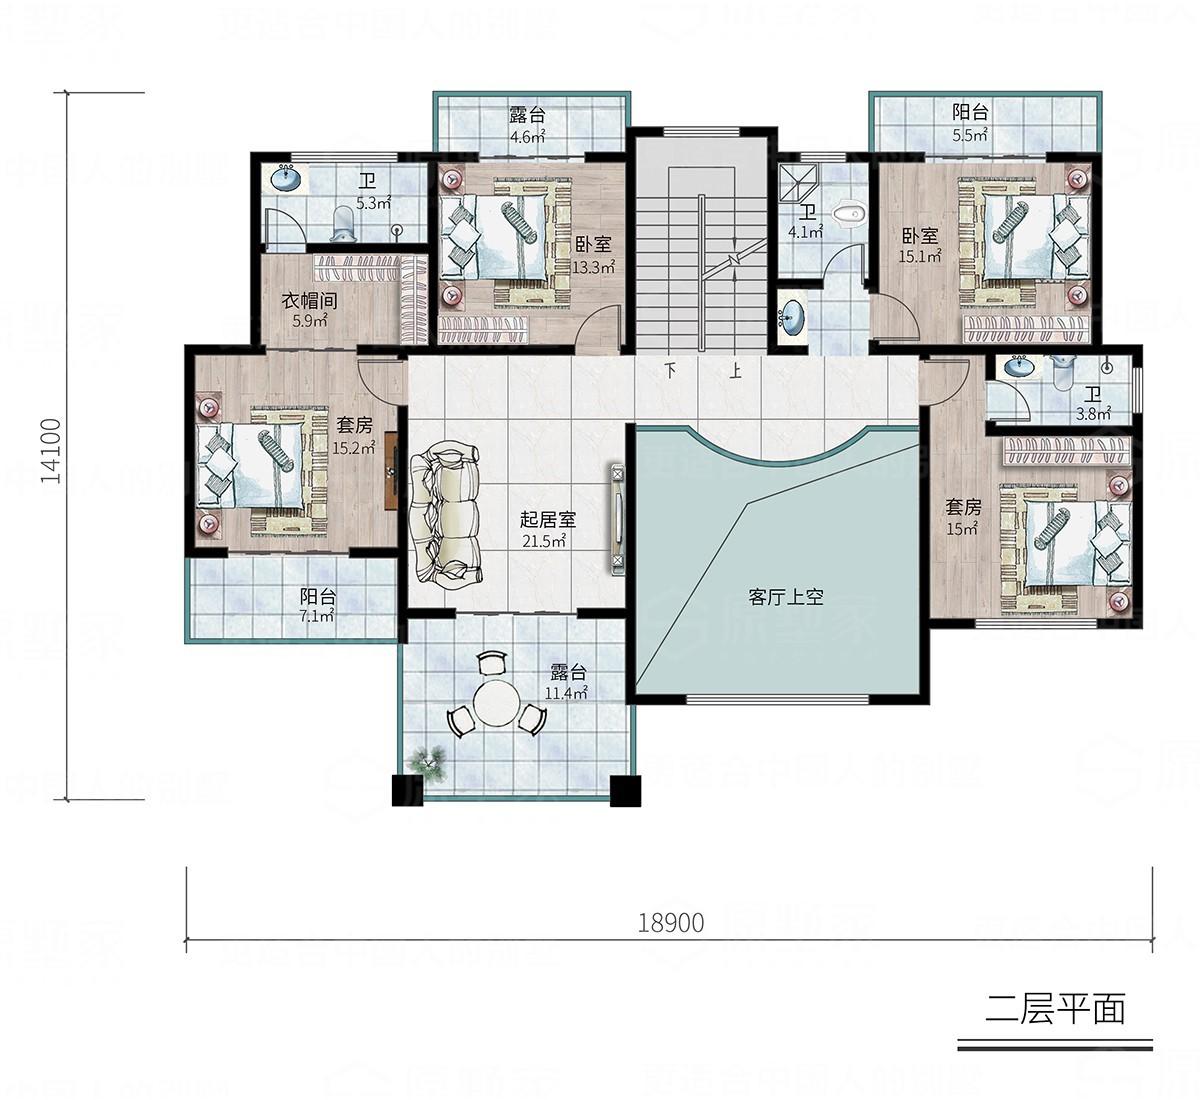 J1 - 欧式浪漫3层别墅